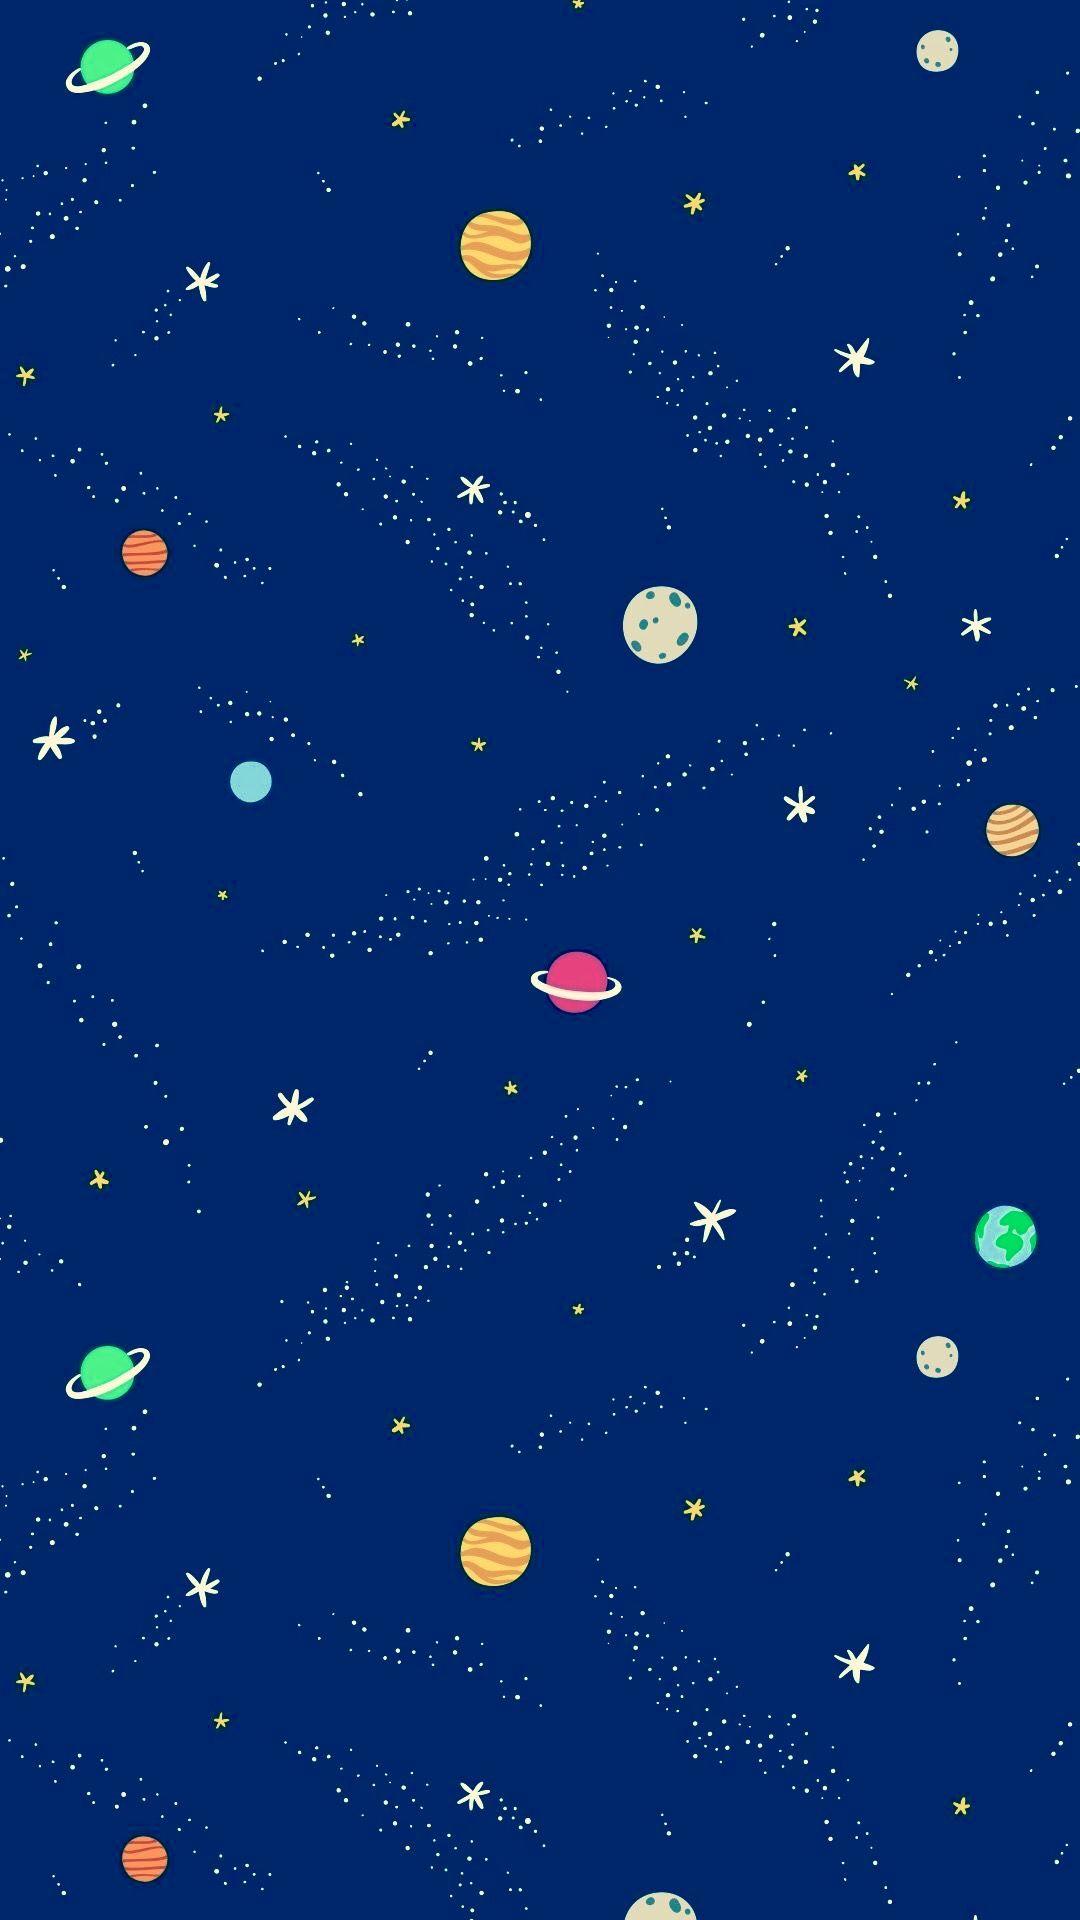 Wonderful Wallpaper Home Screen Galaxy - ef62b34860642d656be15bdb3d7bf30c  Gallery_334326.jpg